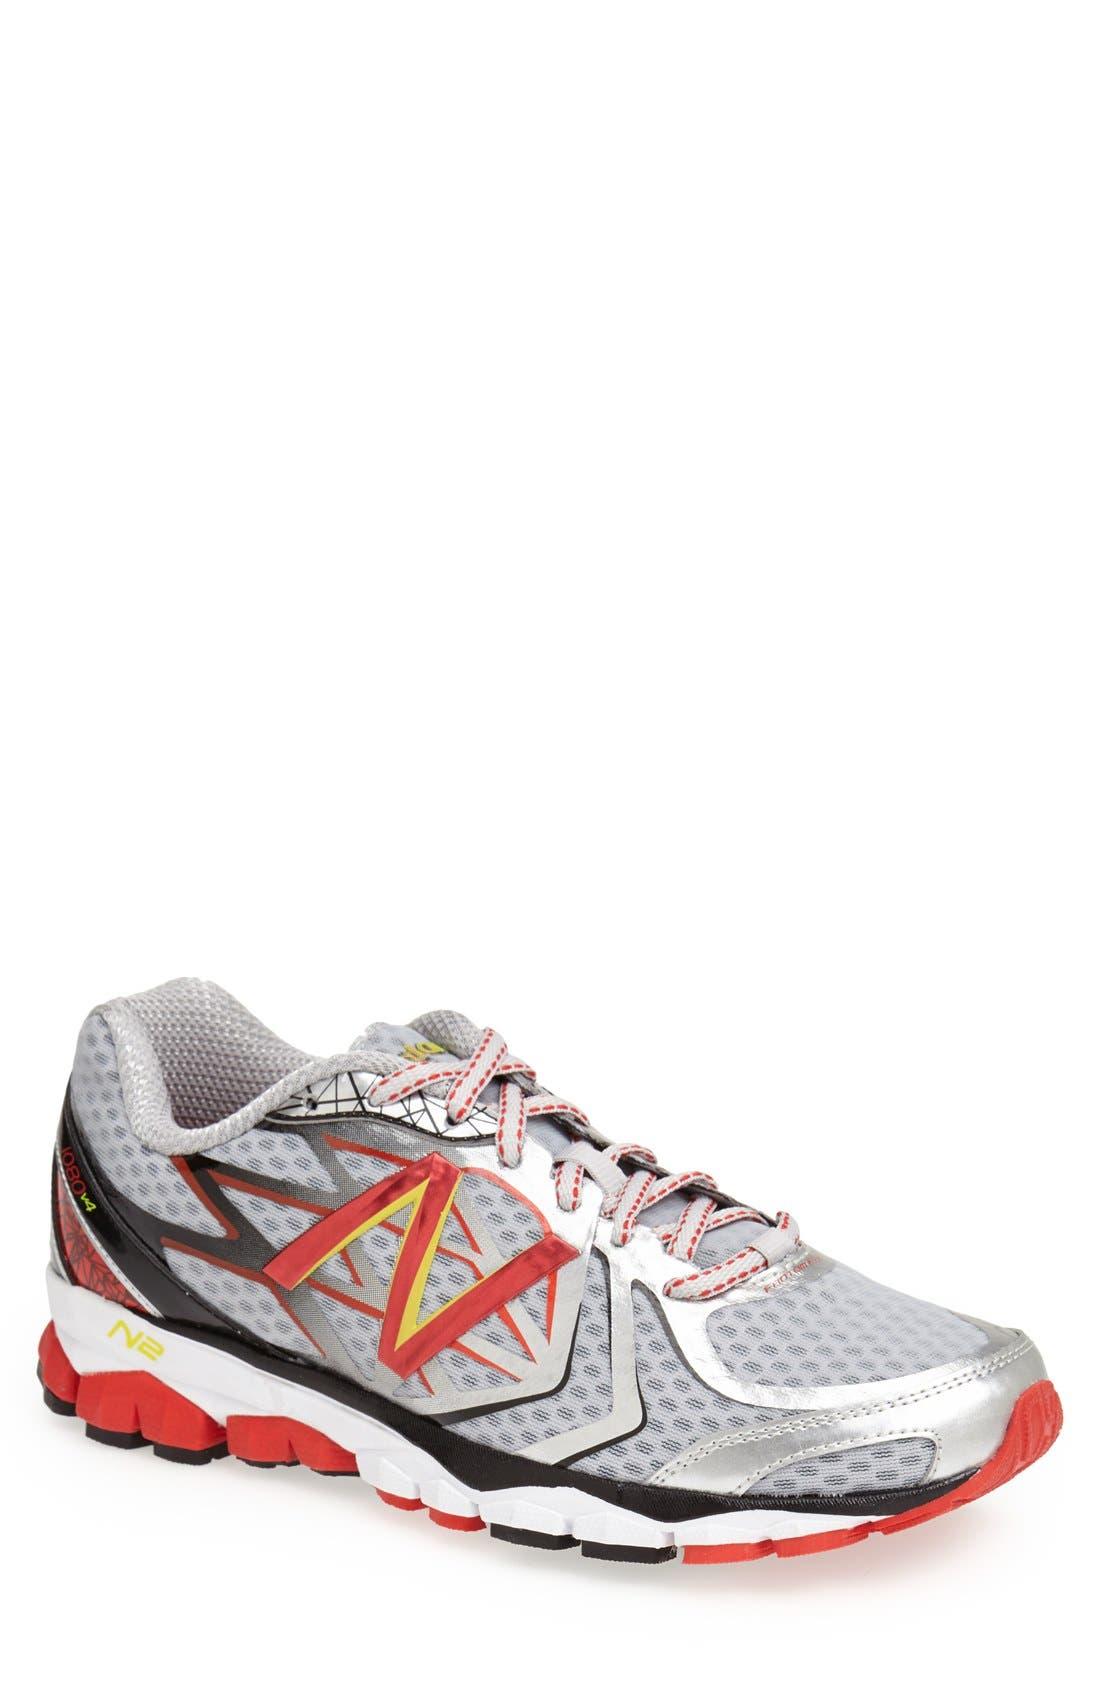 Main Image - New Balance '1080v4' Running Shoe (Men)